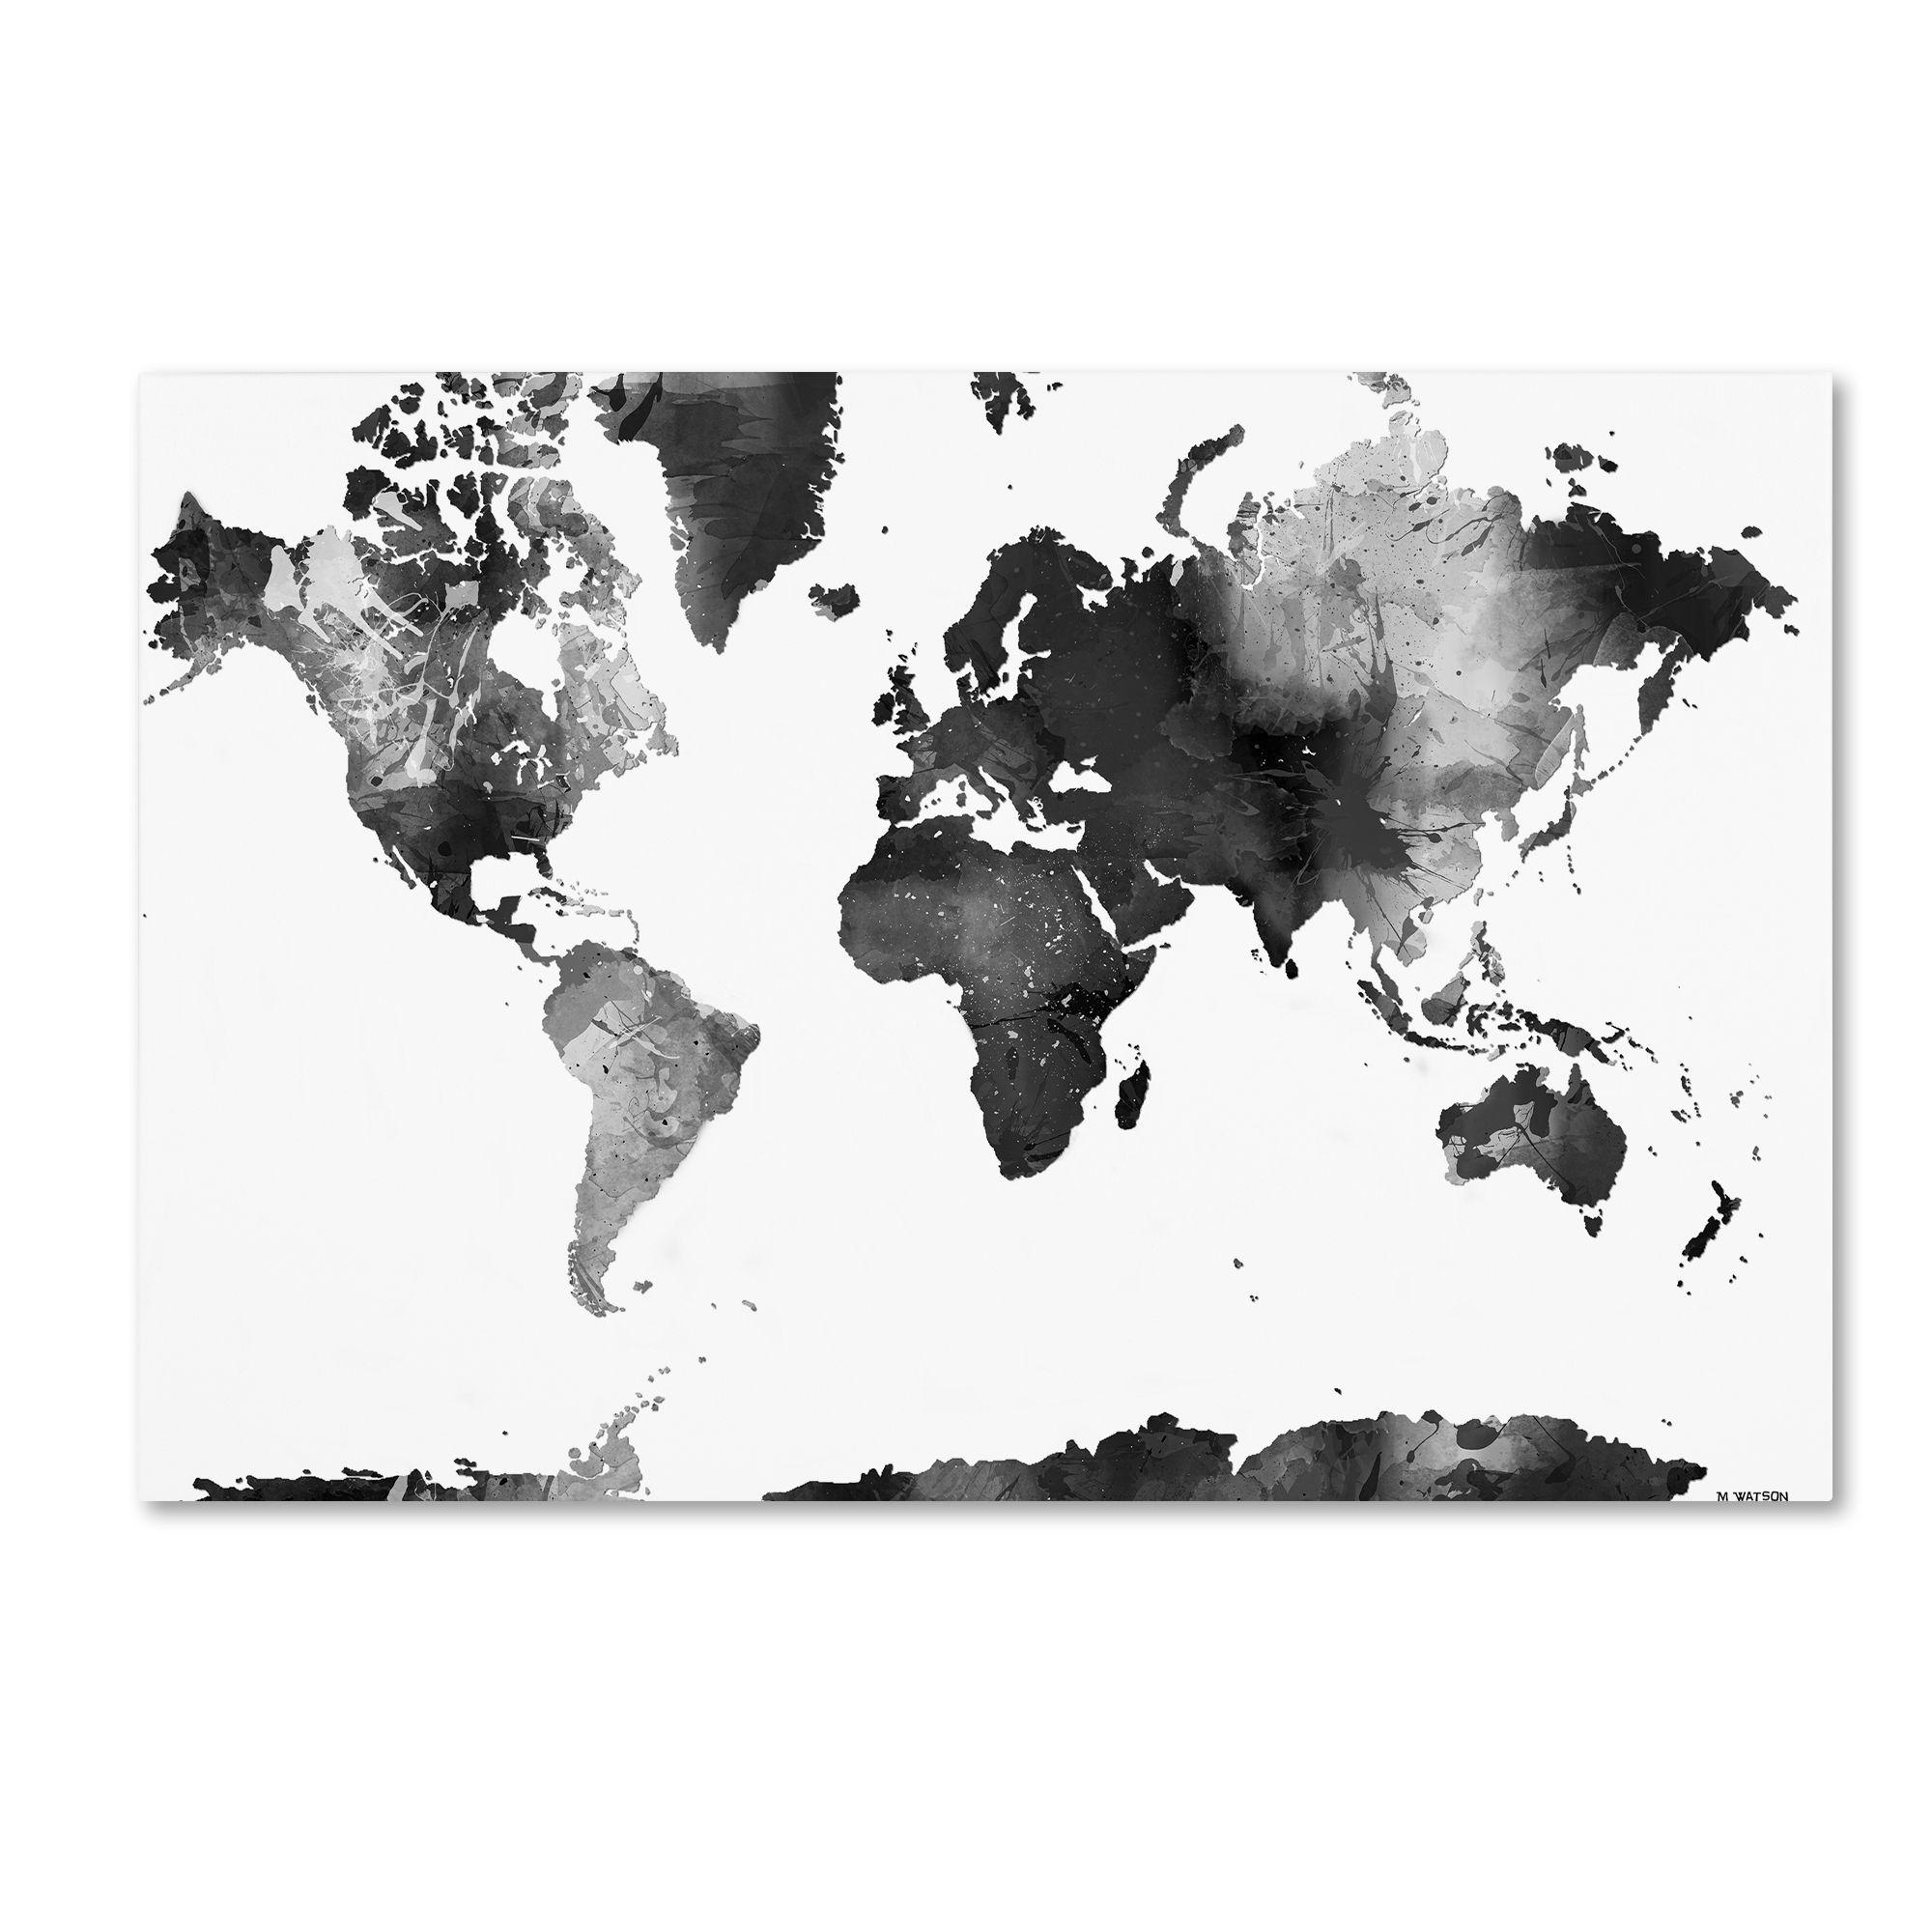 Marlene Watson \'World Map BG-1\' Canvas Art (24x32), Black, Trademark ...